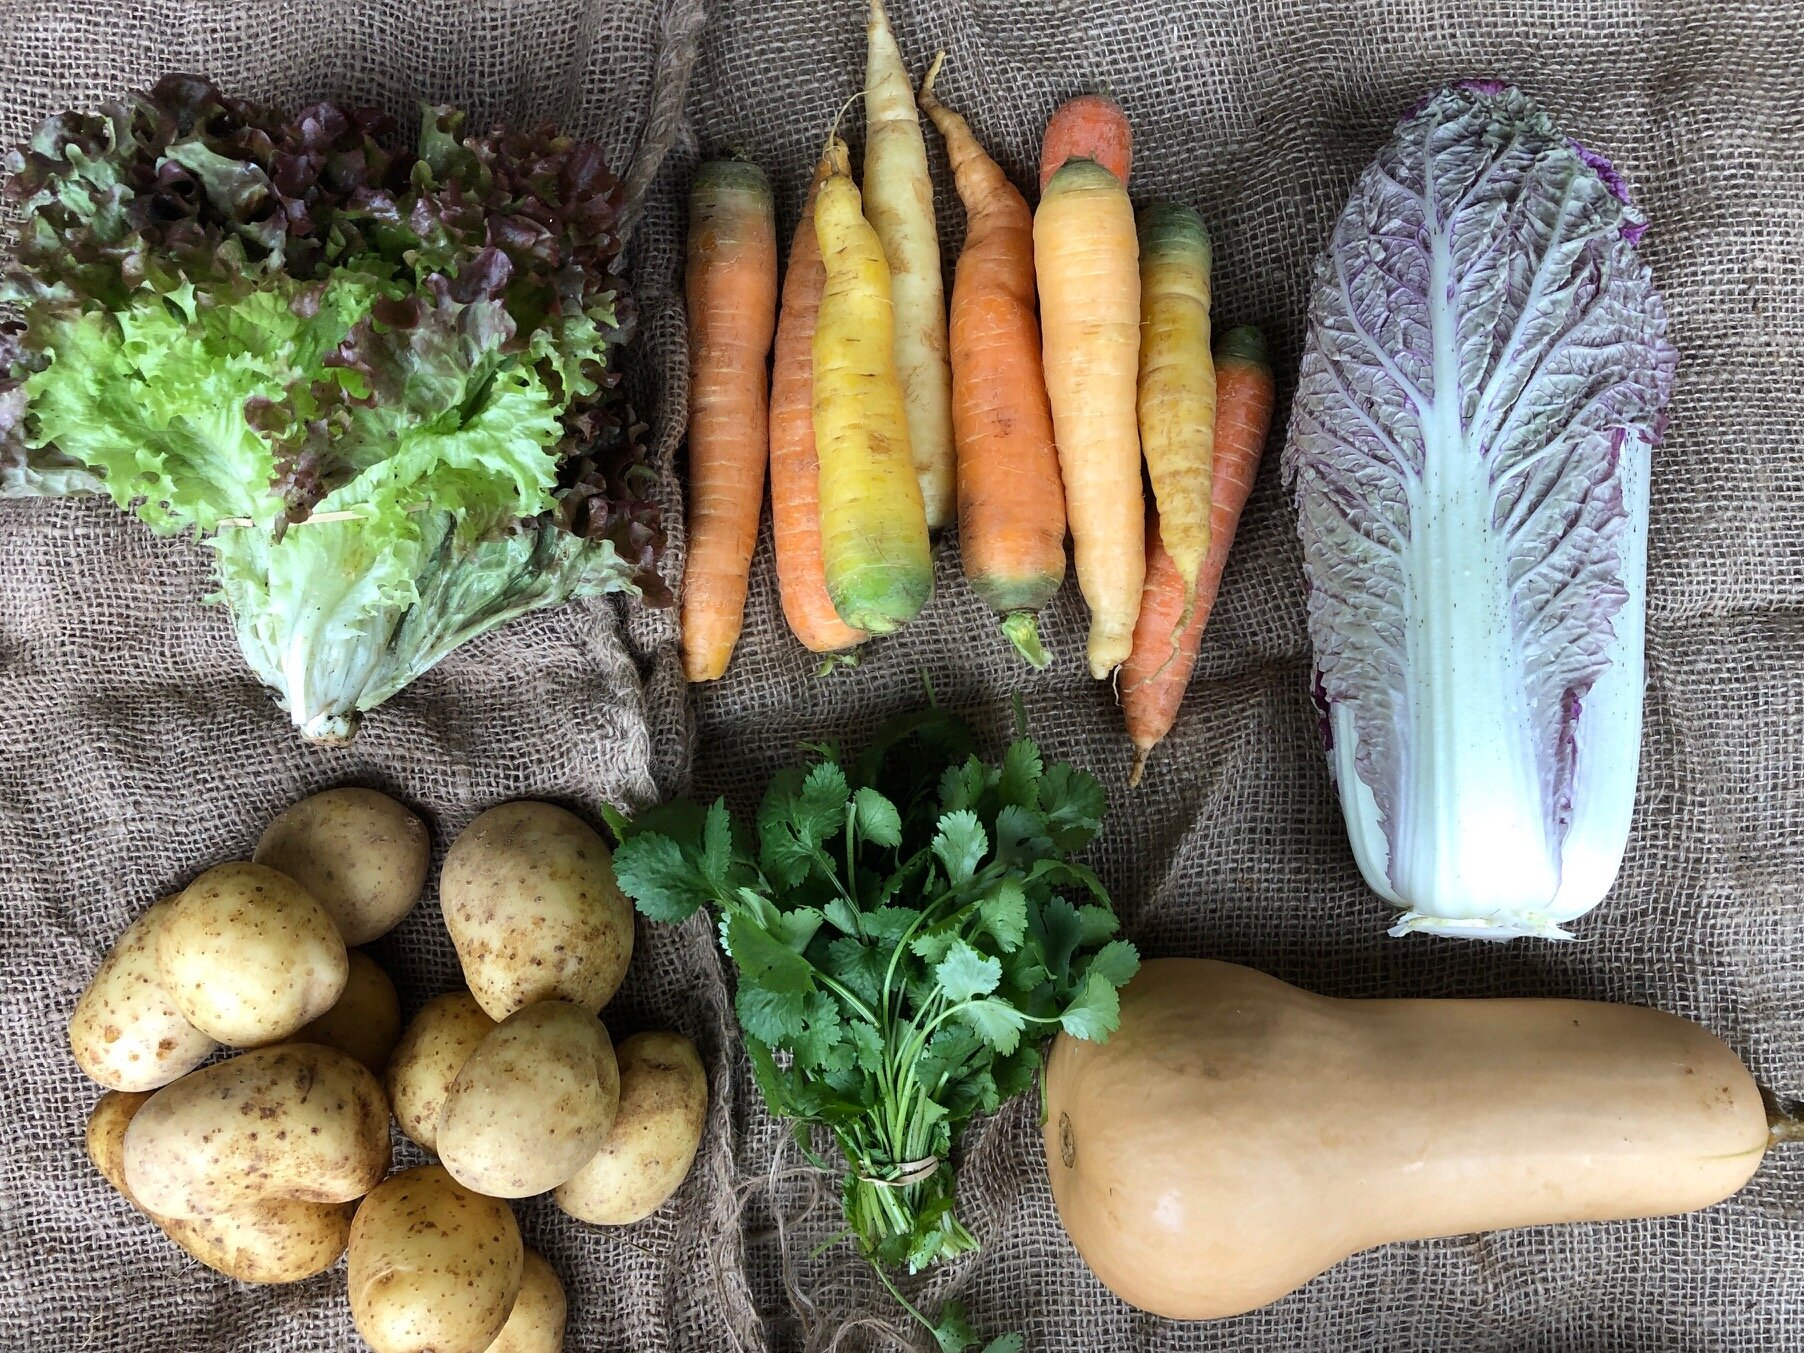 WEEK 5:   2 lbs Gold Potatoes  1 head Purple Napa Cabbage  2 lbs Carrots  1 Butternut Squash  1 bunch Lettuce  1 bunch Cilantro